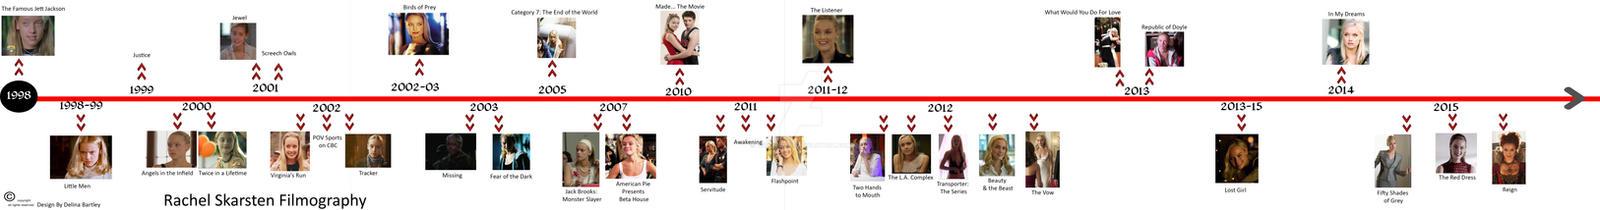 Rachel Skarsten Filmography Timeline by vortexbabe